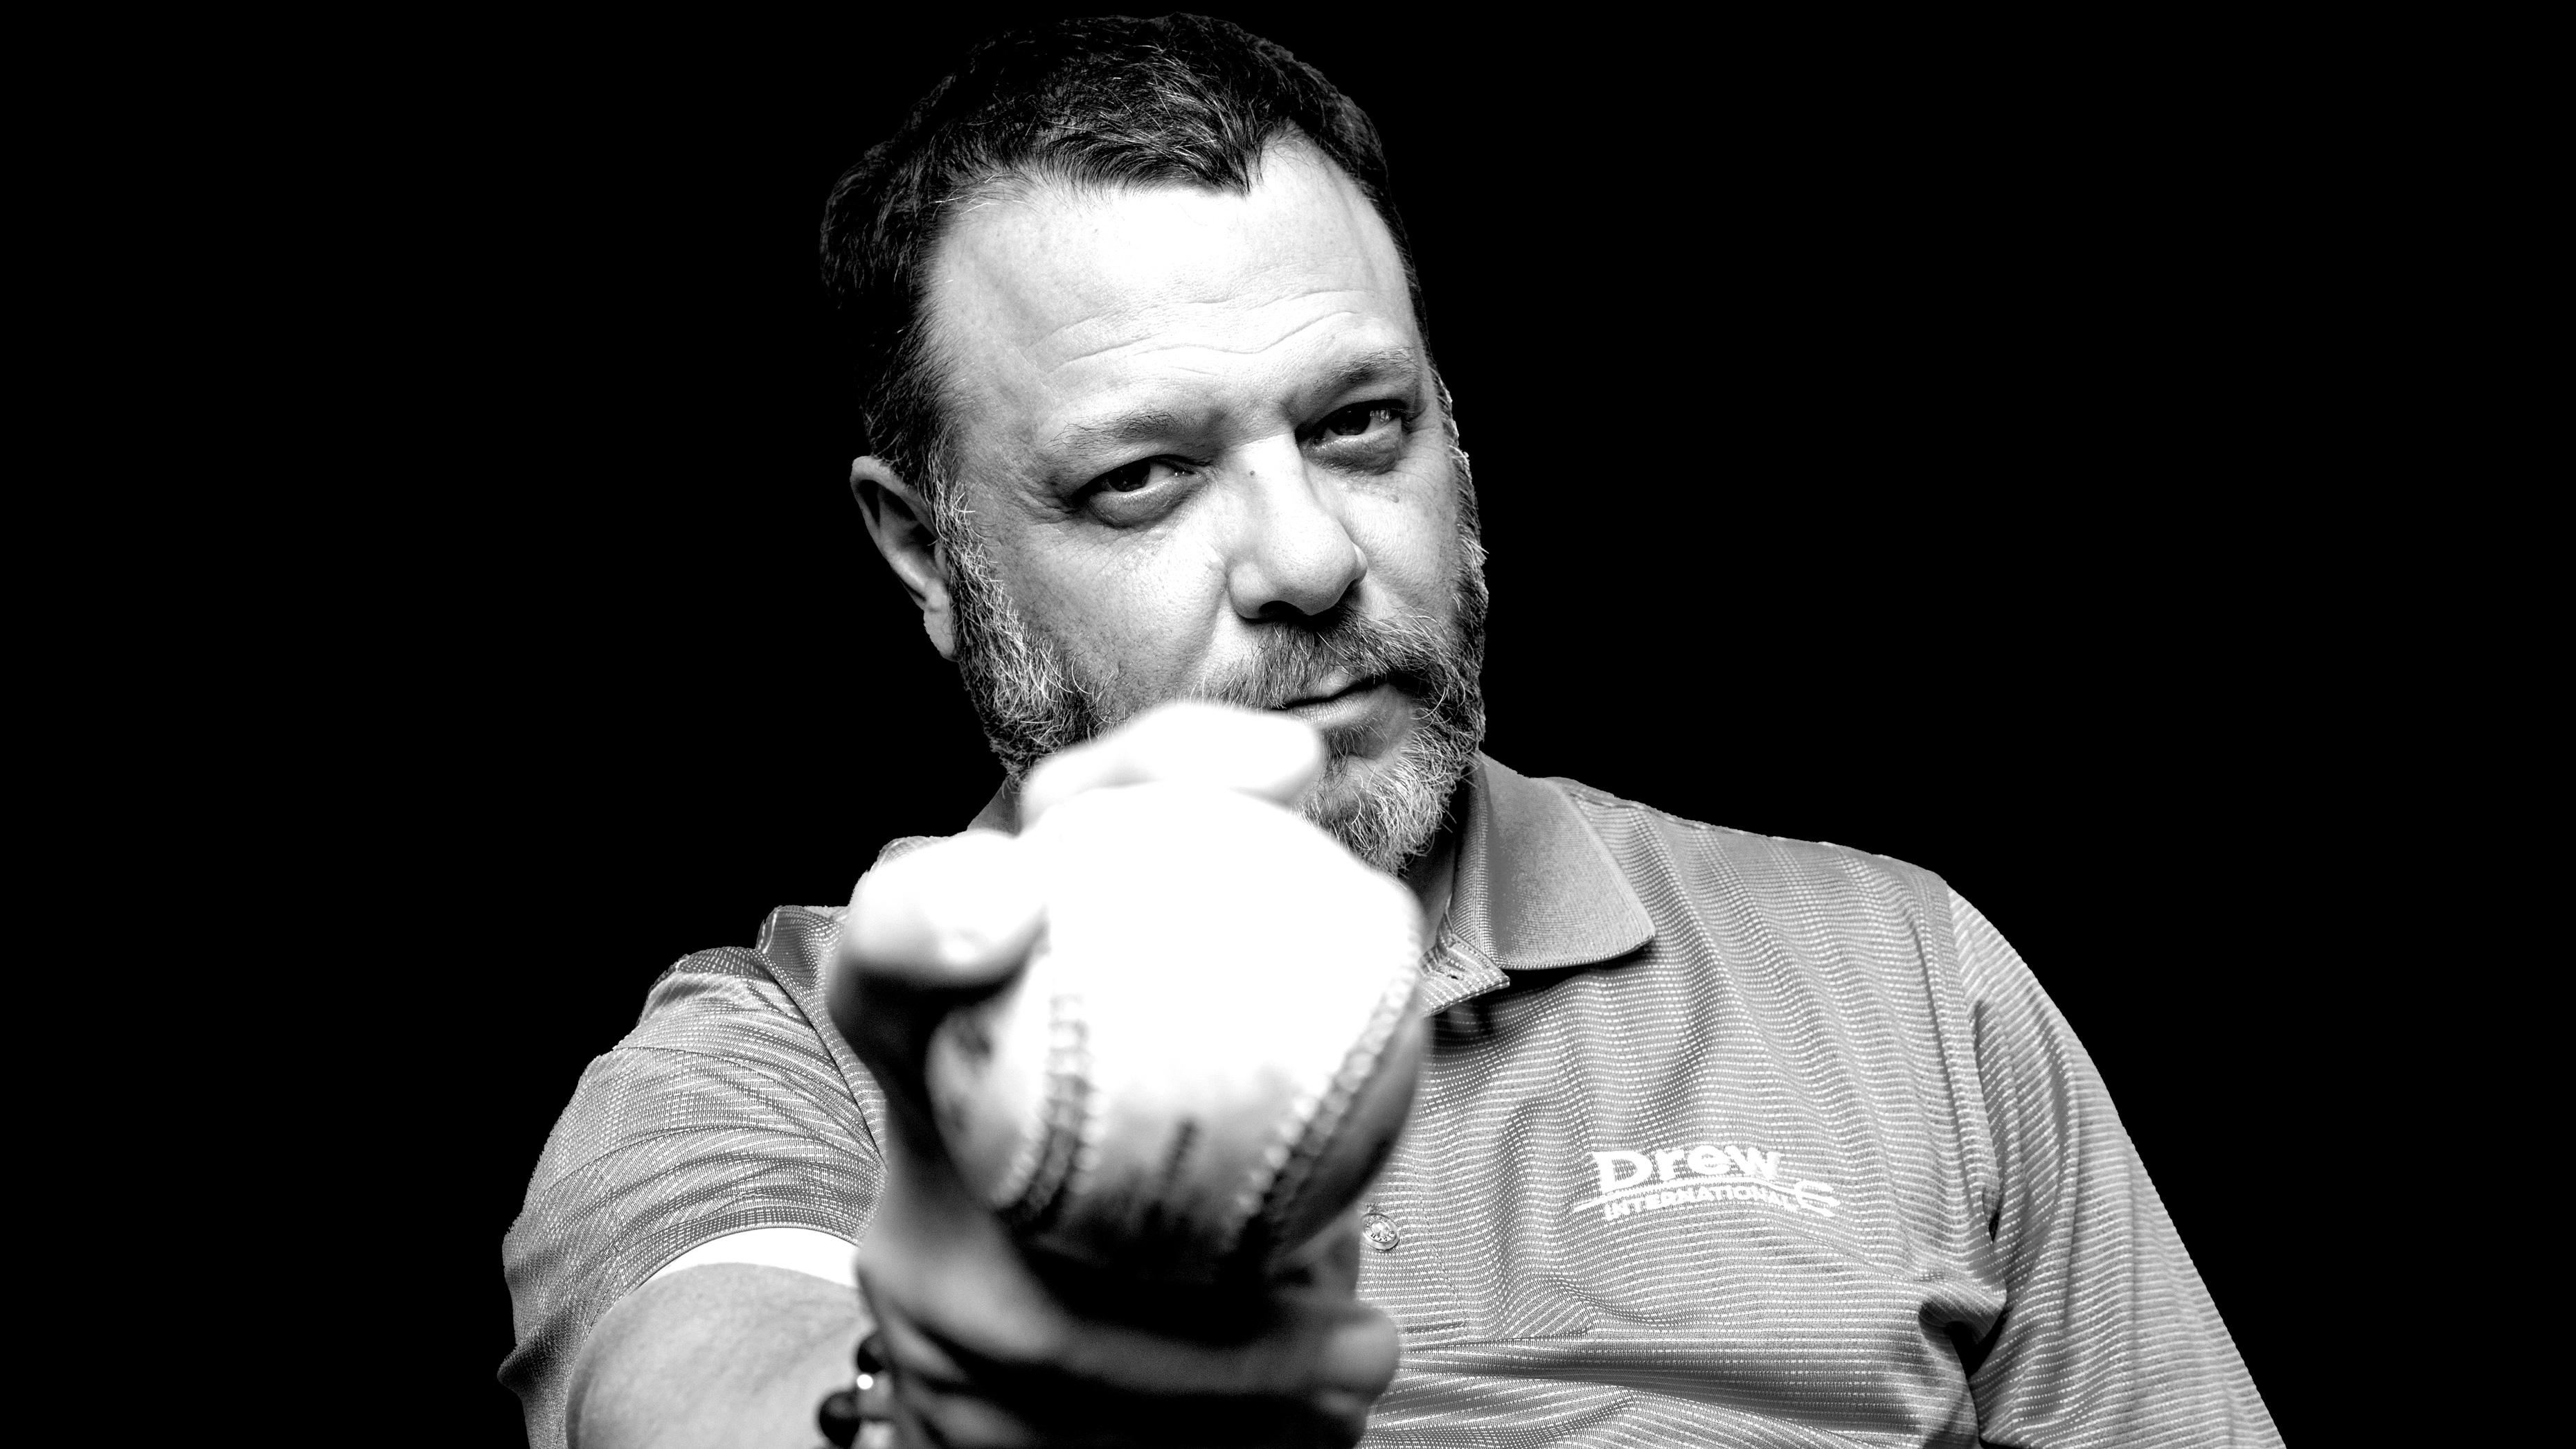 Black and white photo of Frank Monteiro of Waterbury CT holding a baseball, wearing a Drew International shirt